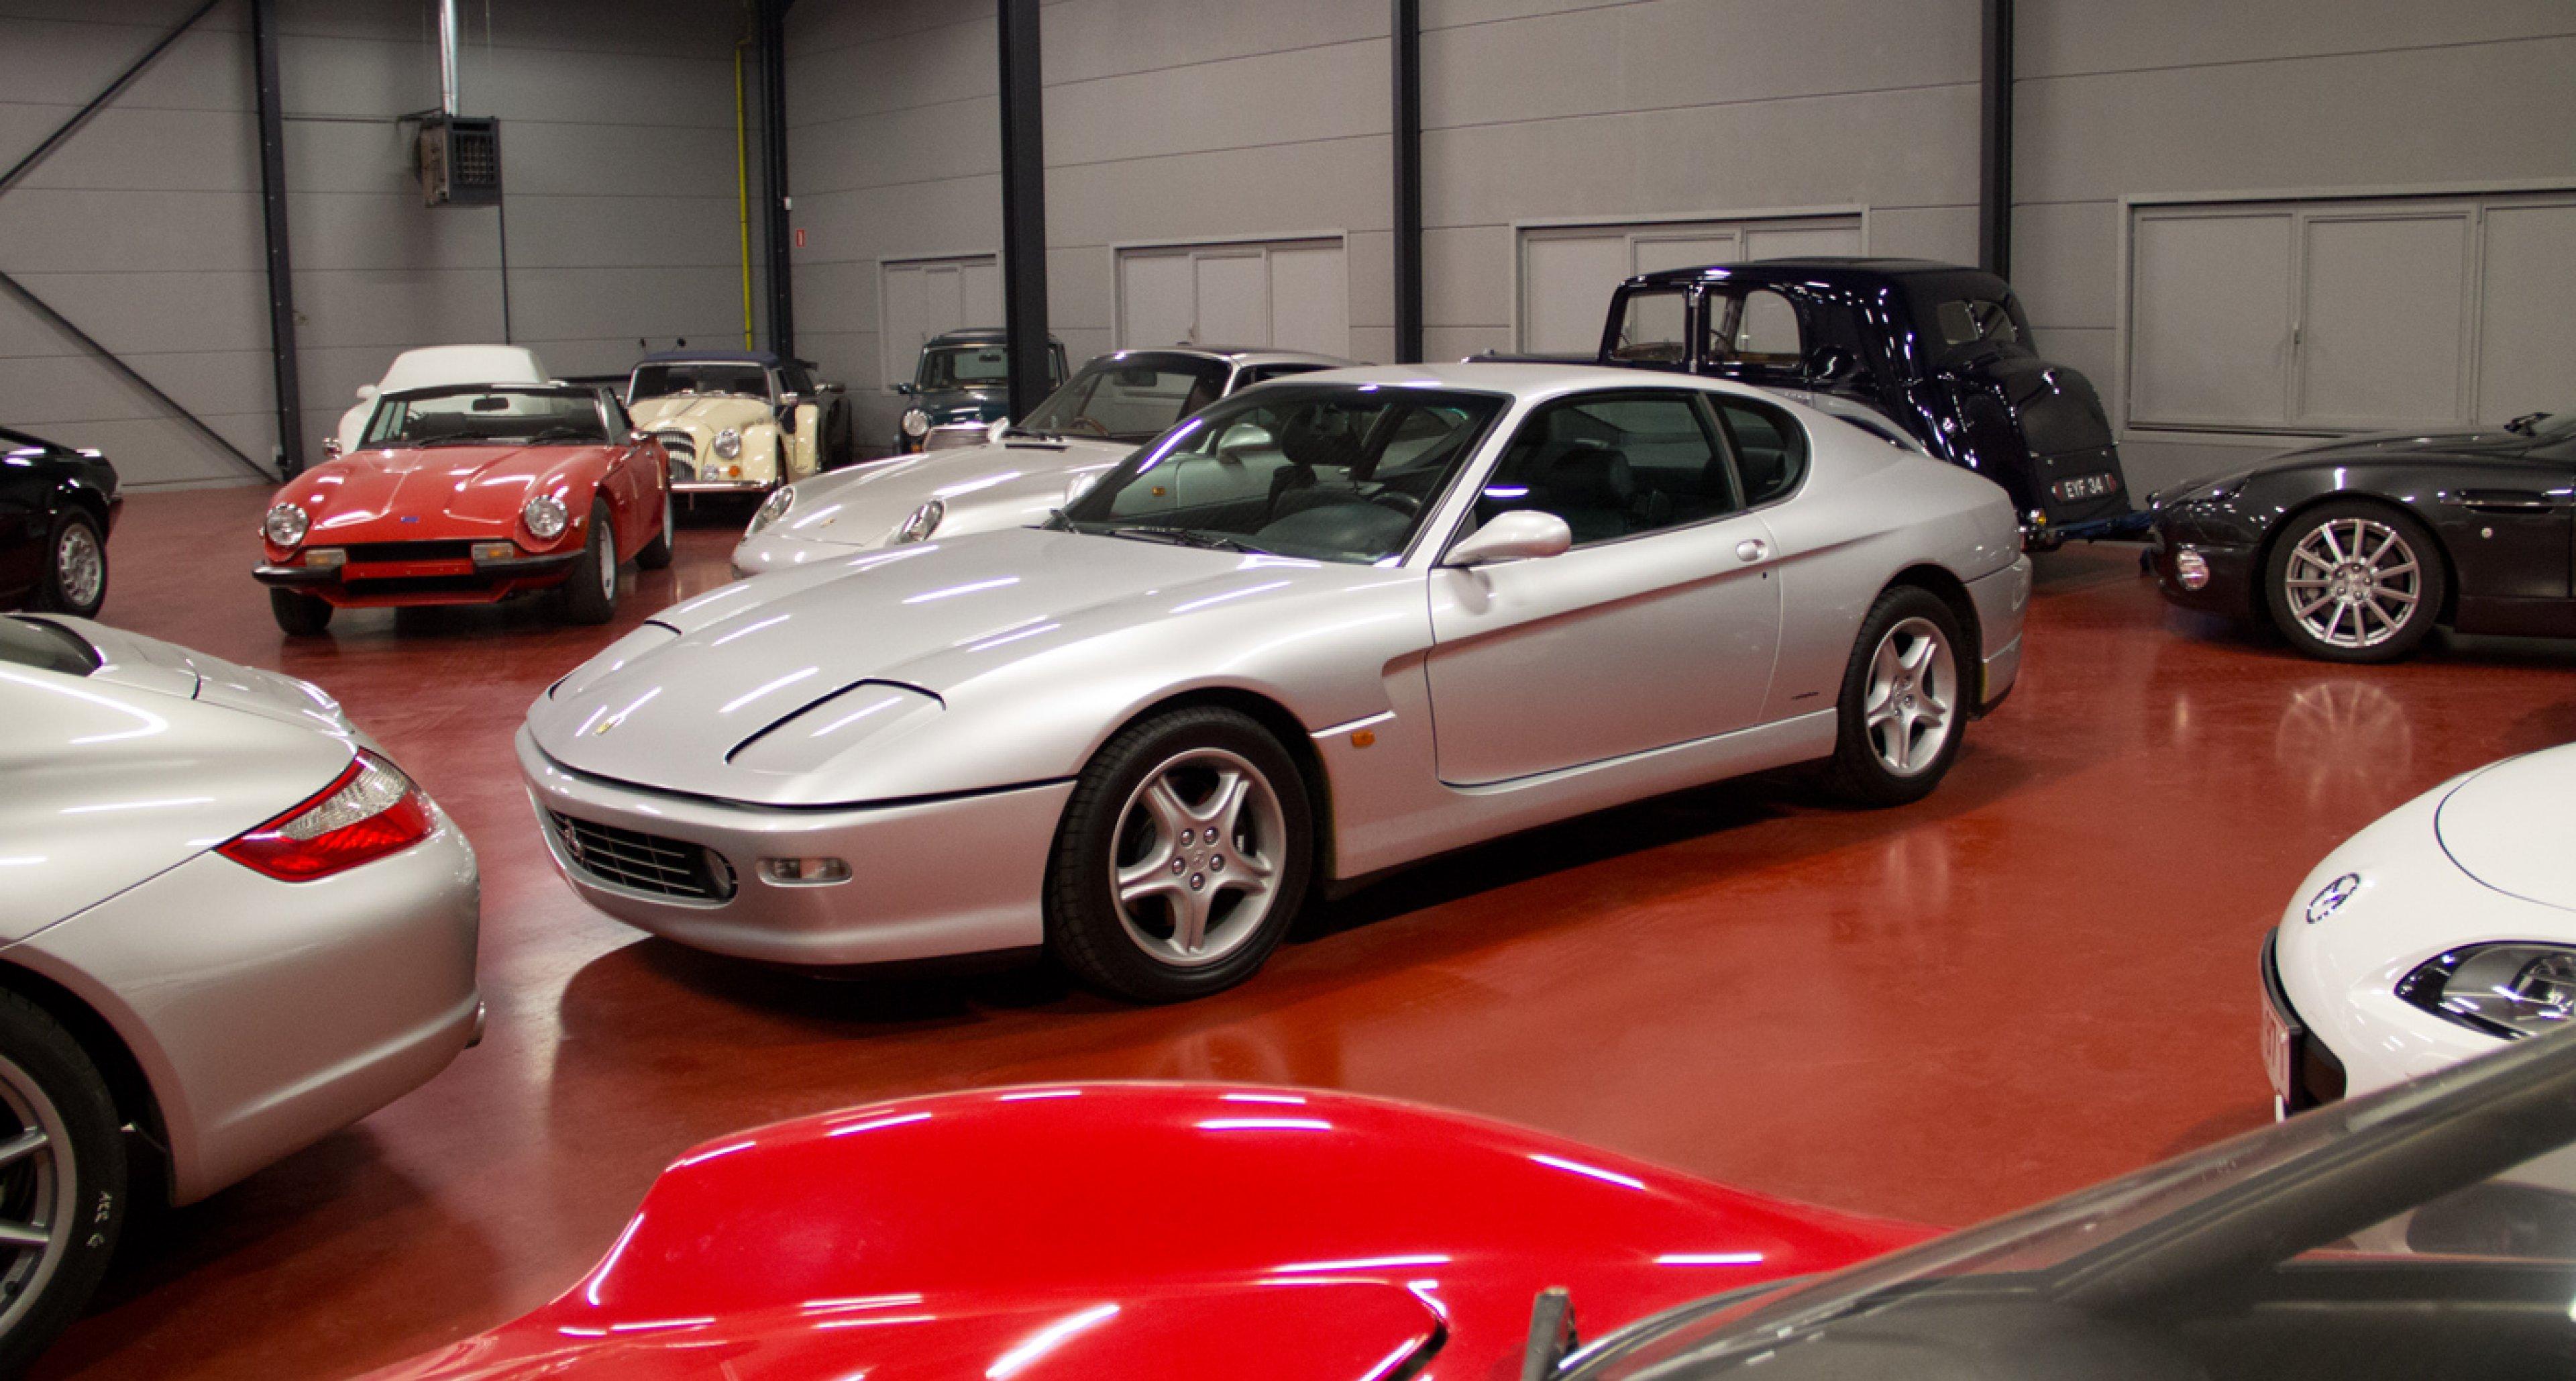 British and Sportscars